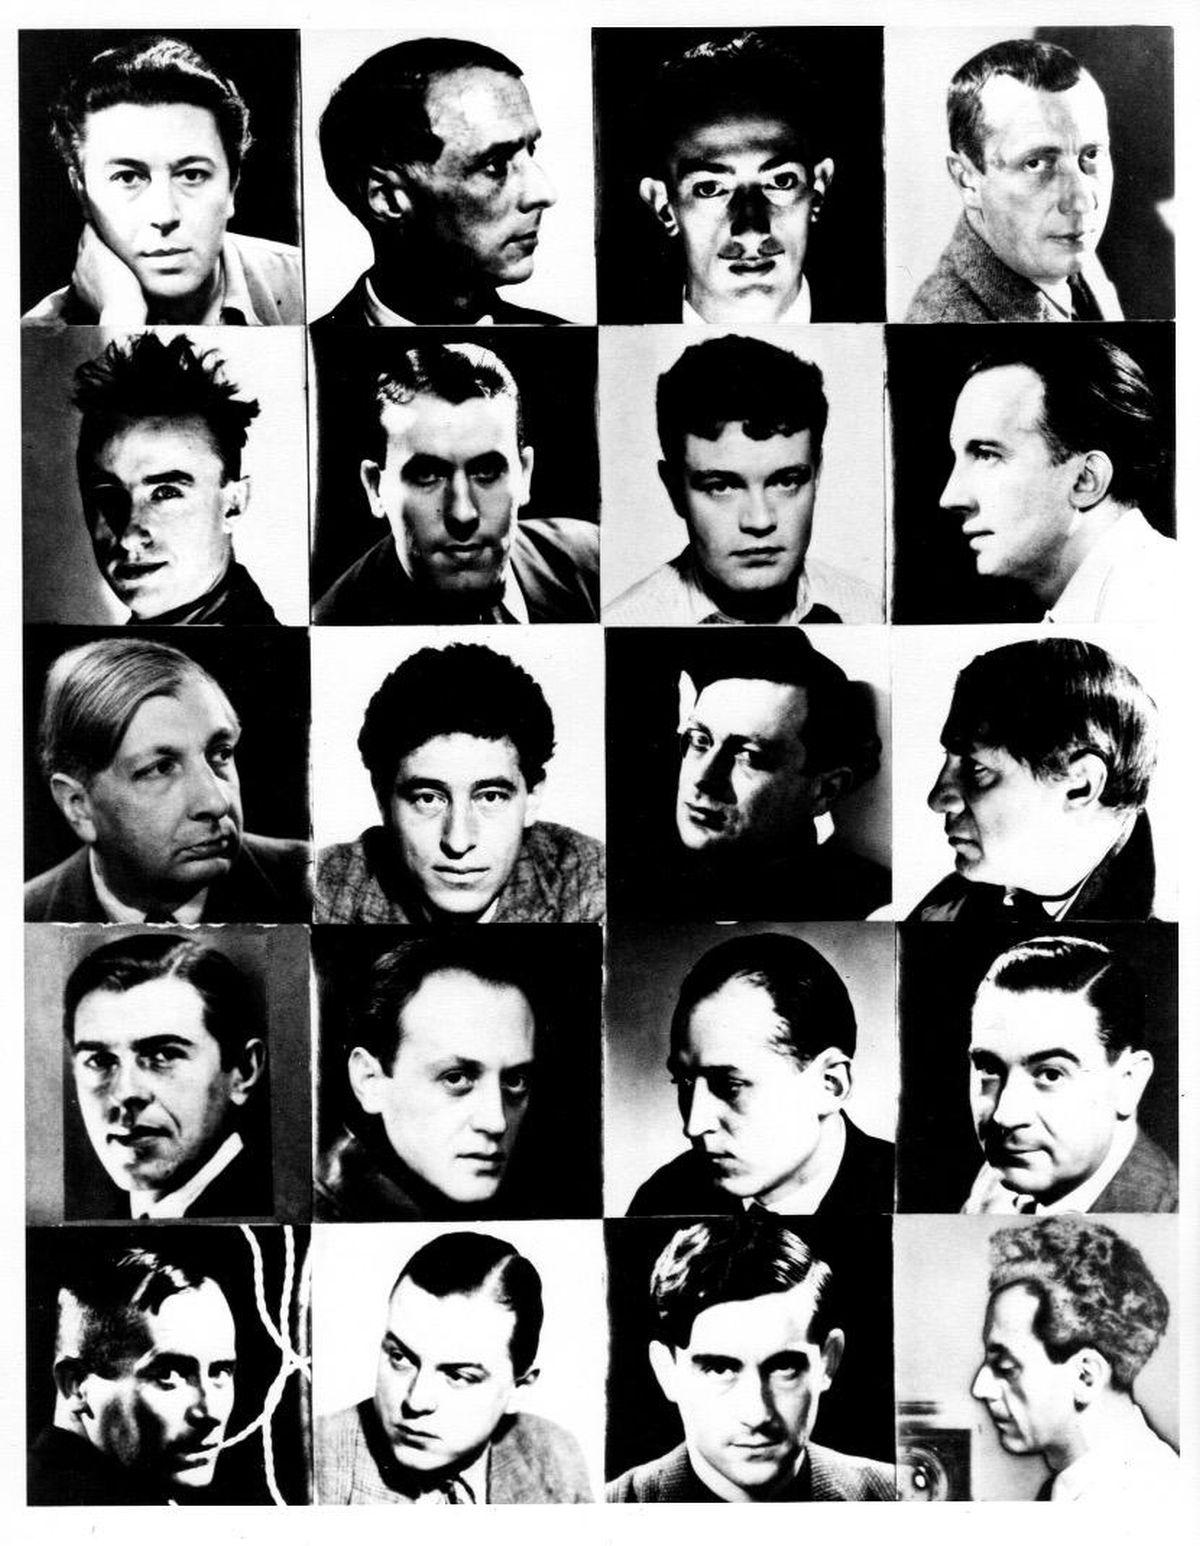 Man Ray - Original Fotografie/Nachlass 1934/91, Echiquier surréaliste kopen? Bied vanaf 499!